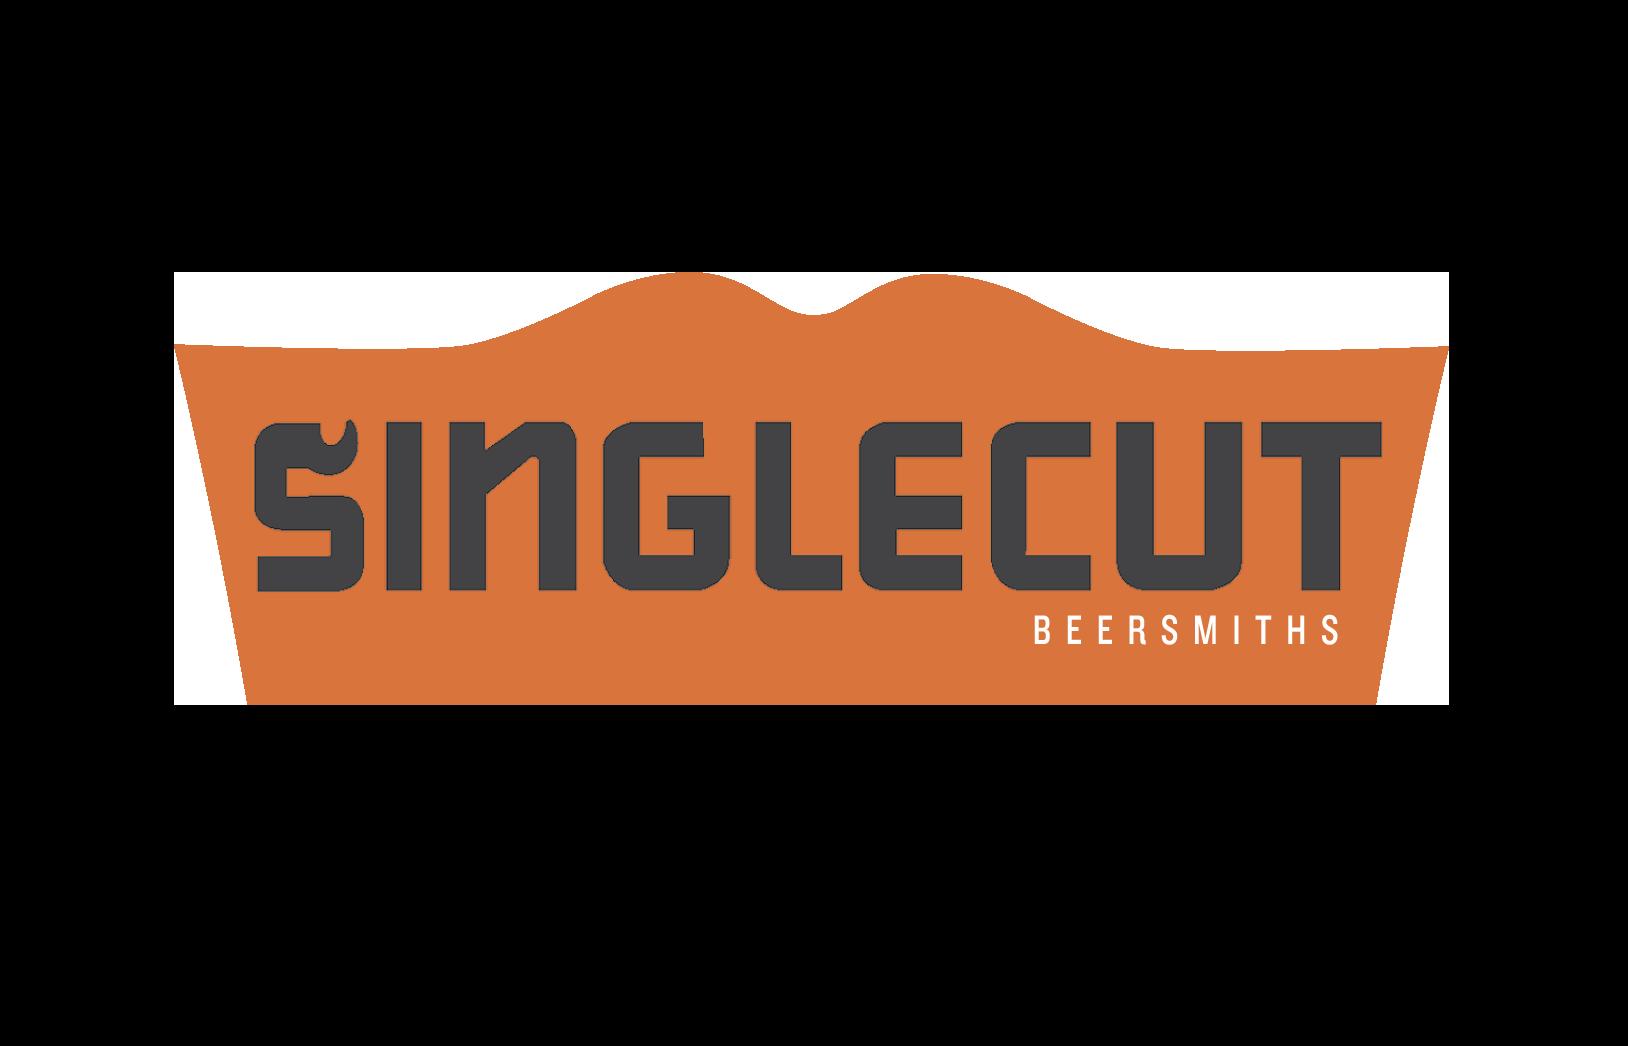 Singlecut beersmiths logo